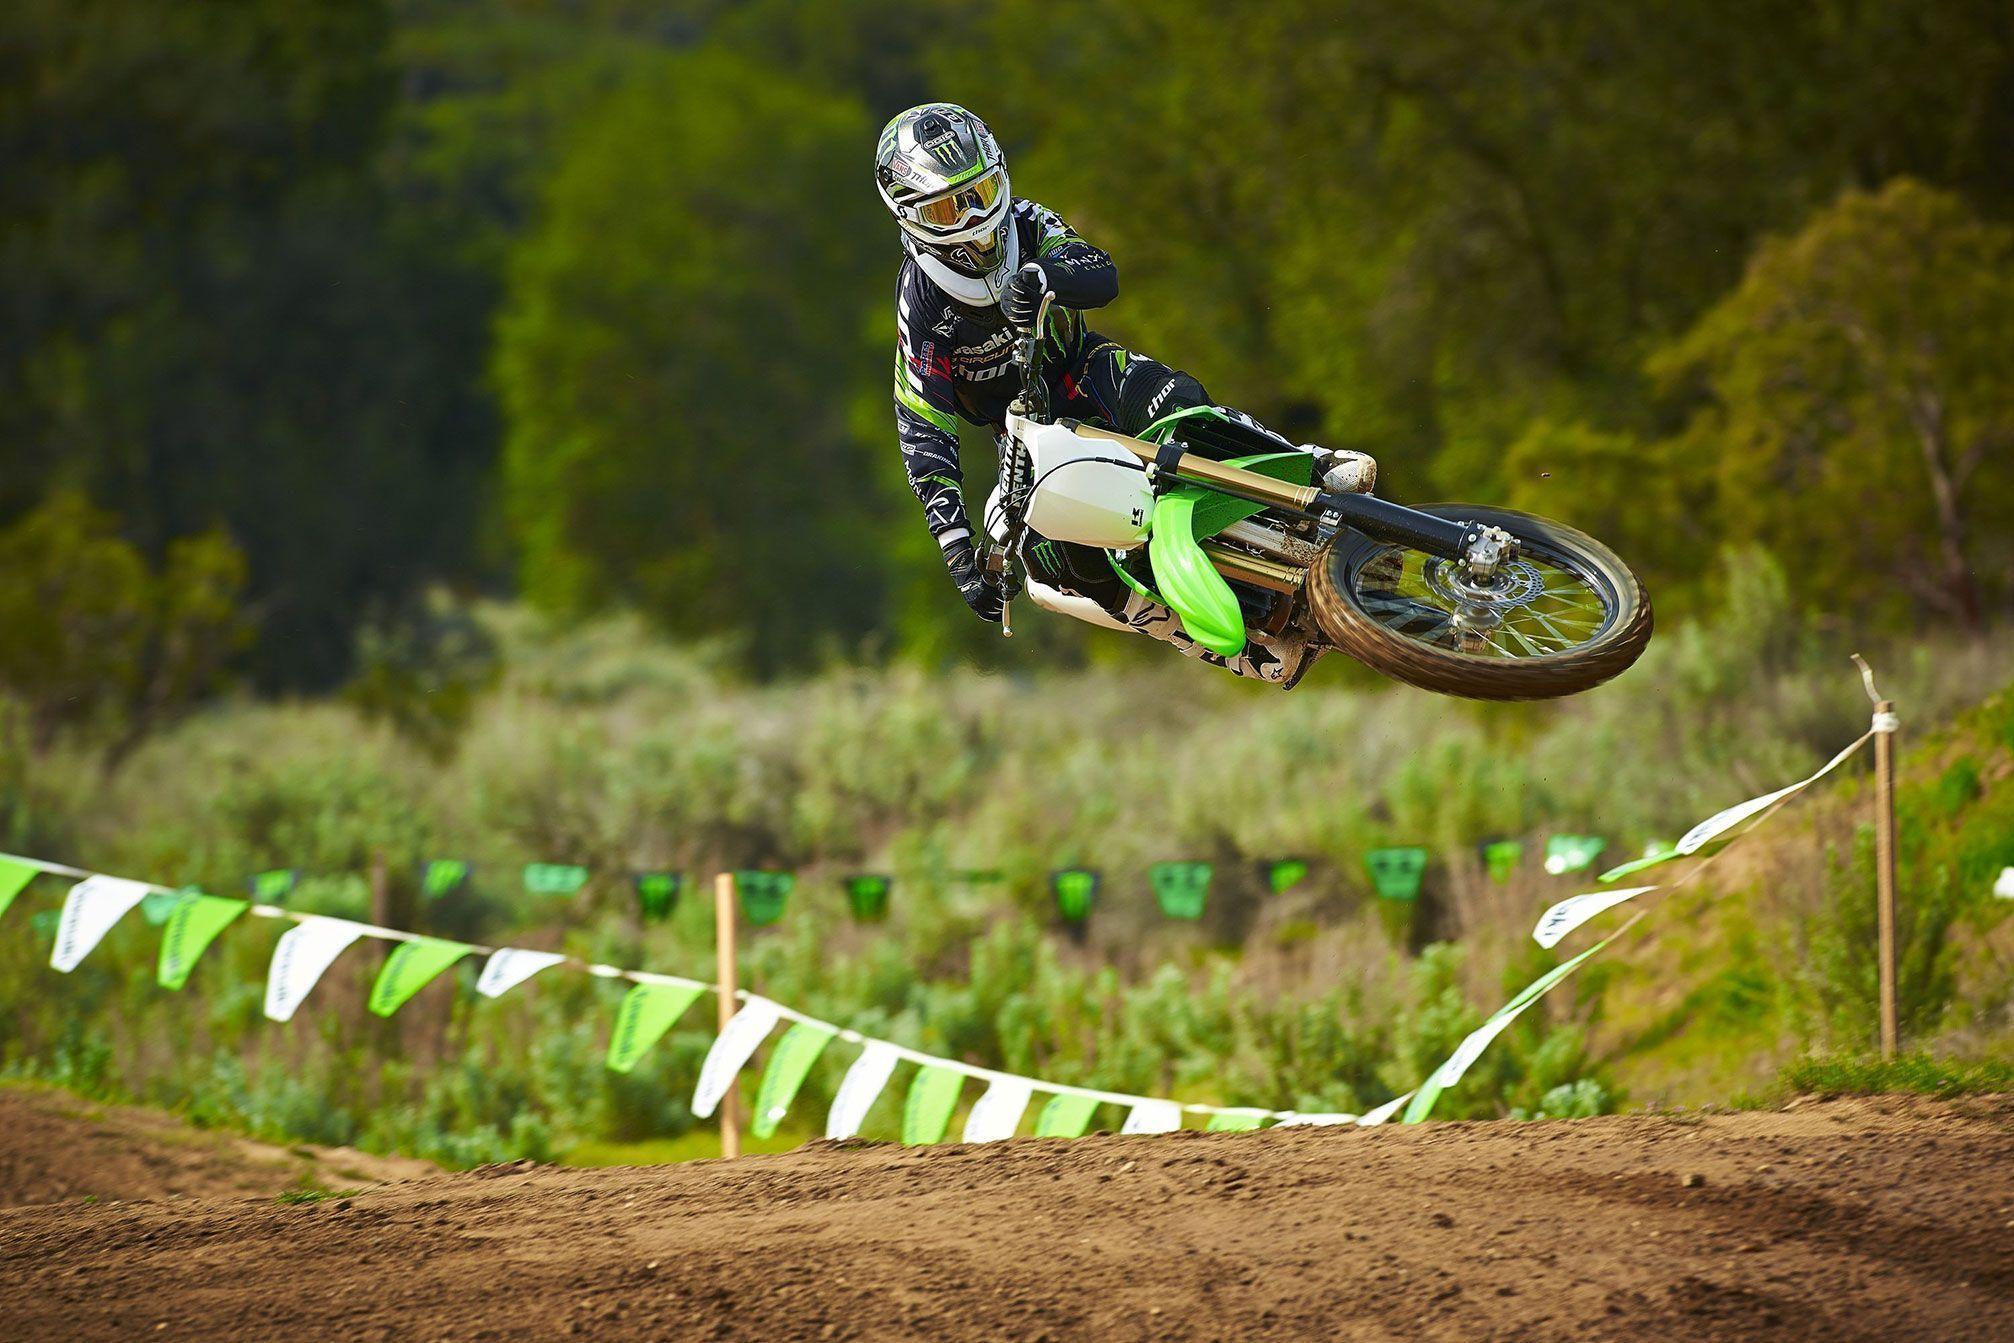 2014 Kawasaki KX250F Motocross Wallpaper Wide Or HD